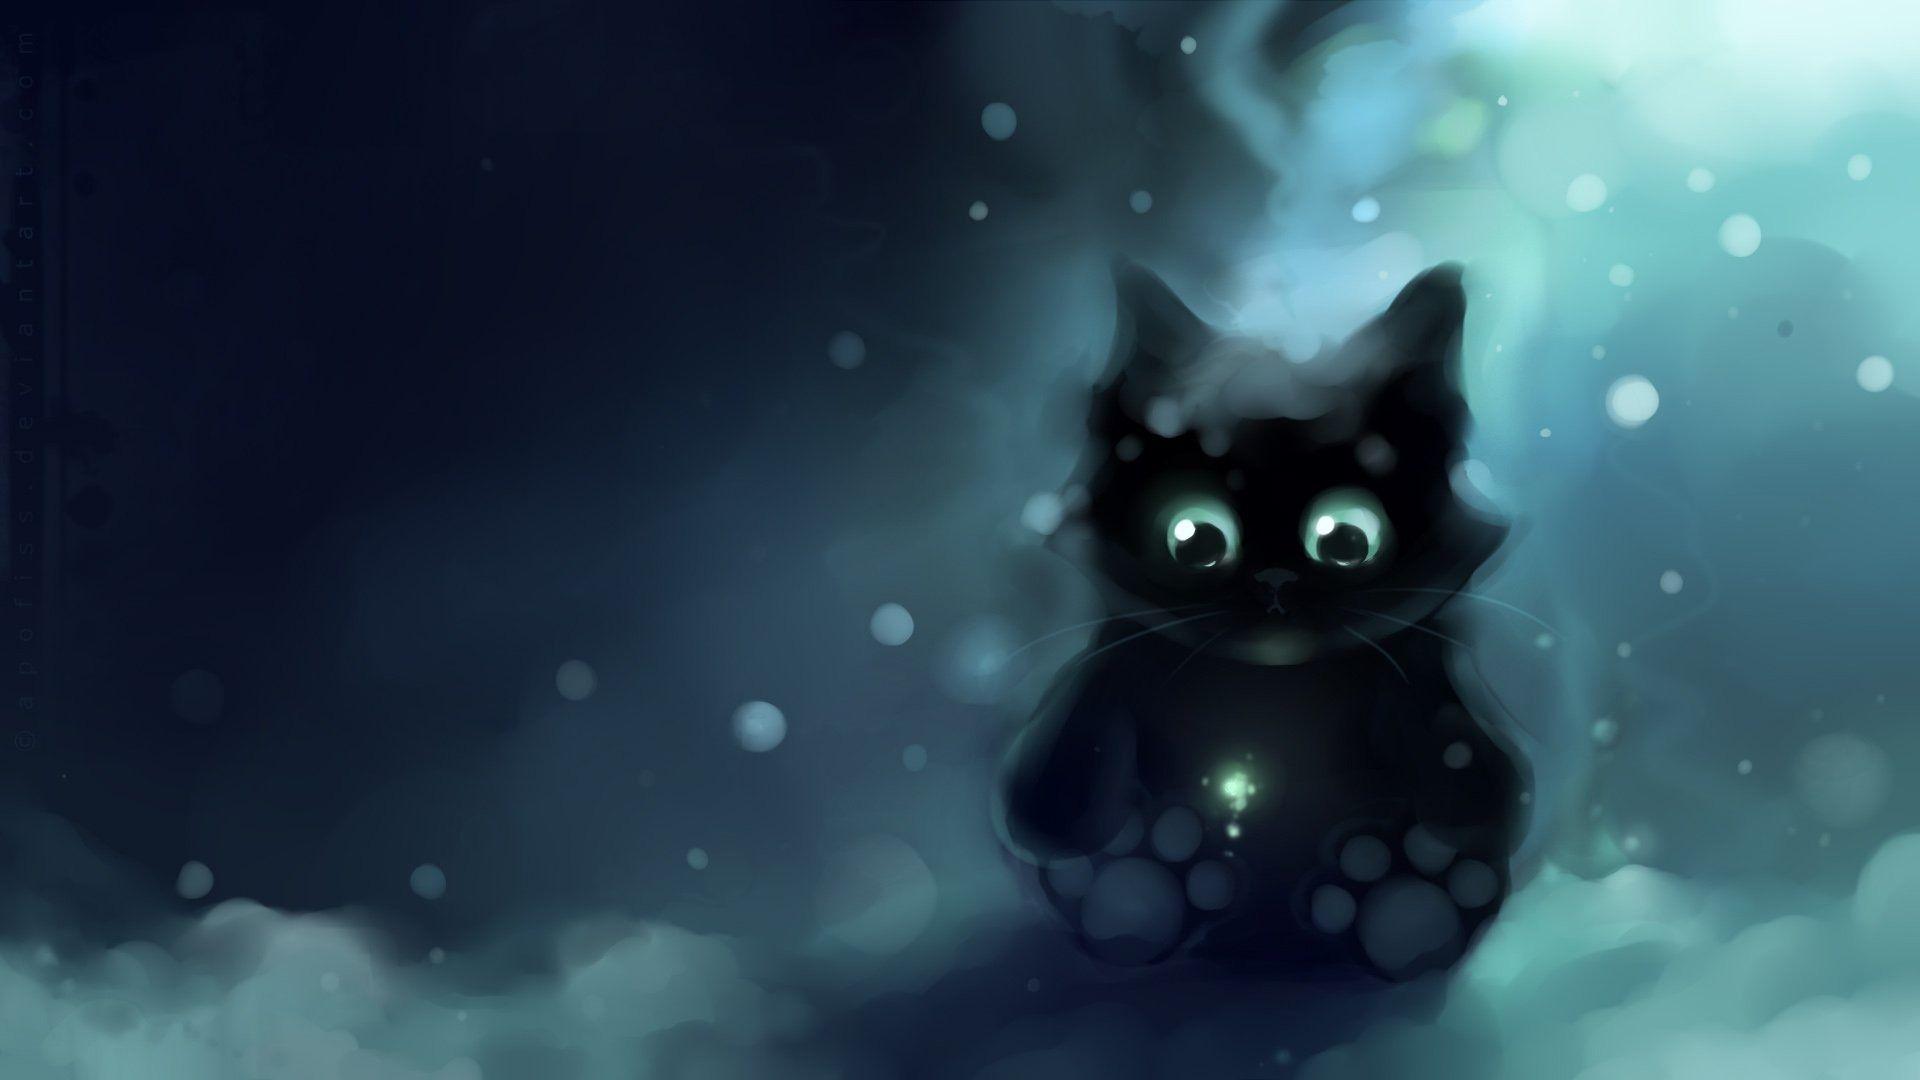 apofiss small black cat wallpaper watercolor illustrations #18